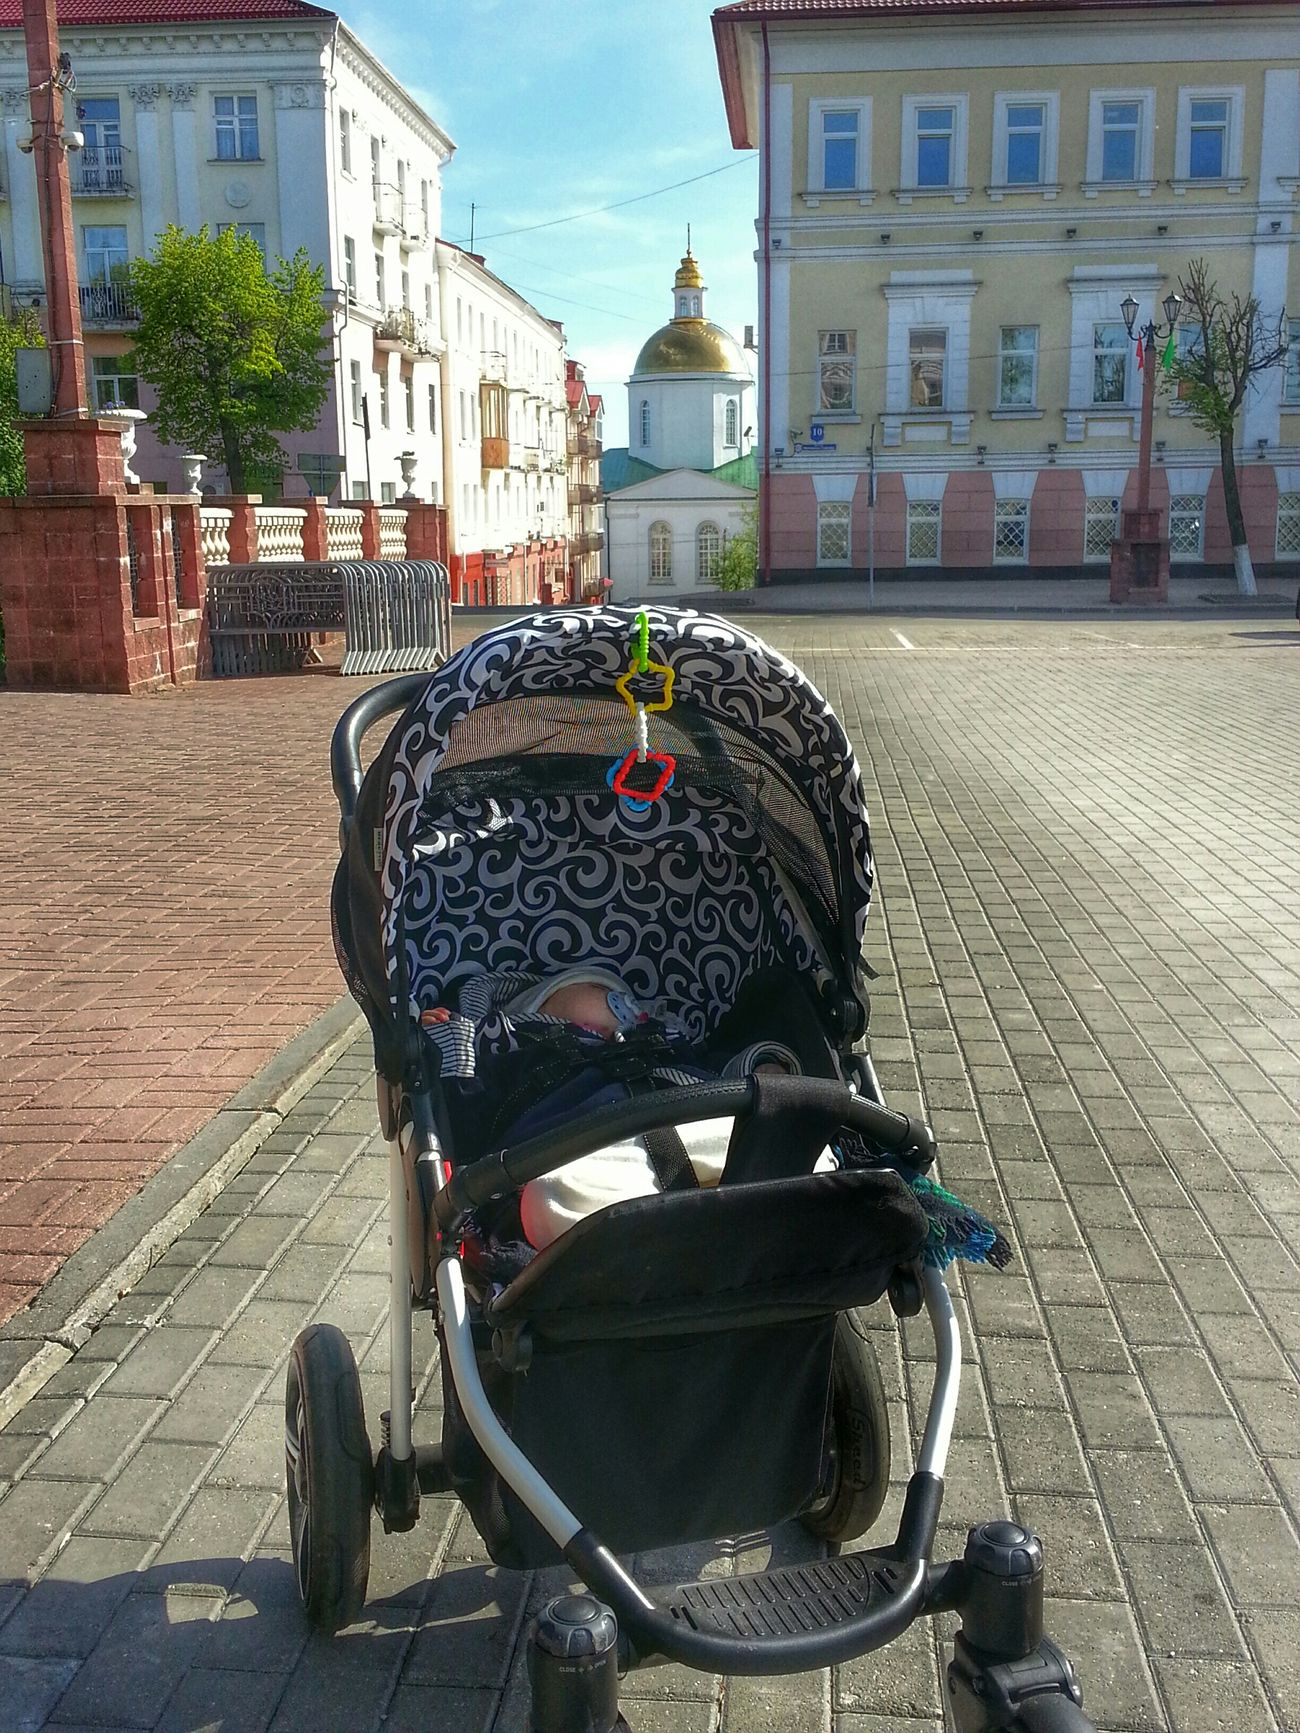 Polotsk Belarus PolotskCity Karina Springtime May